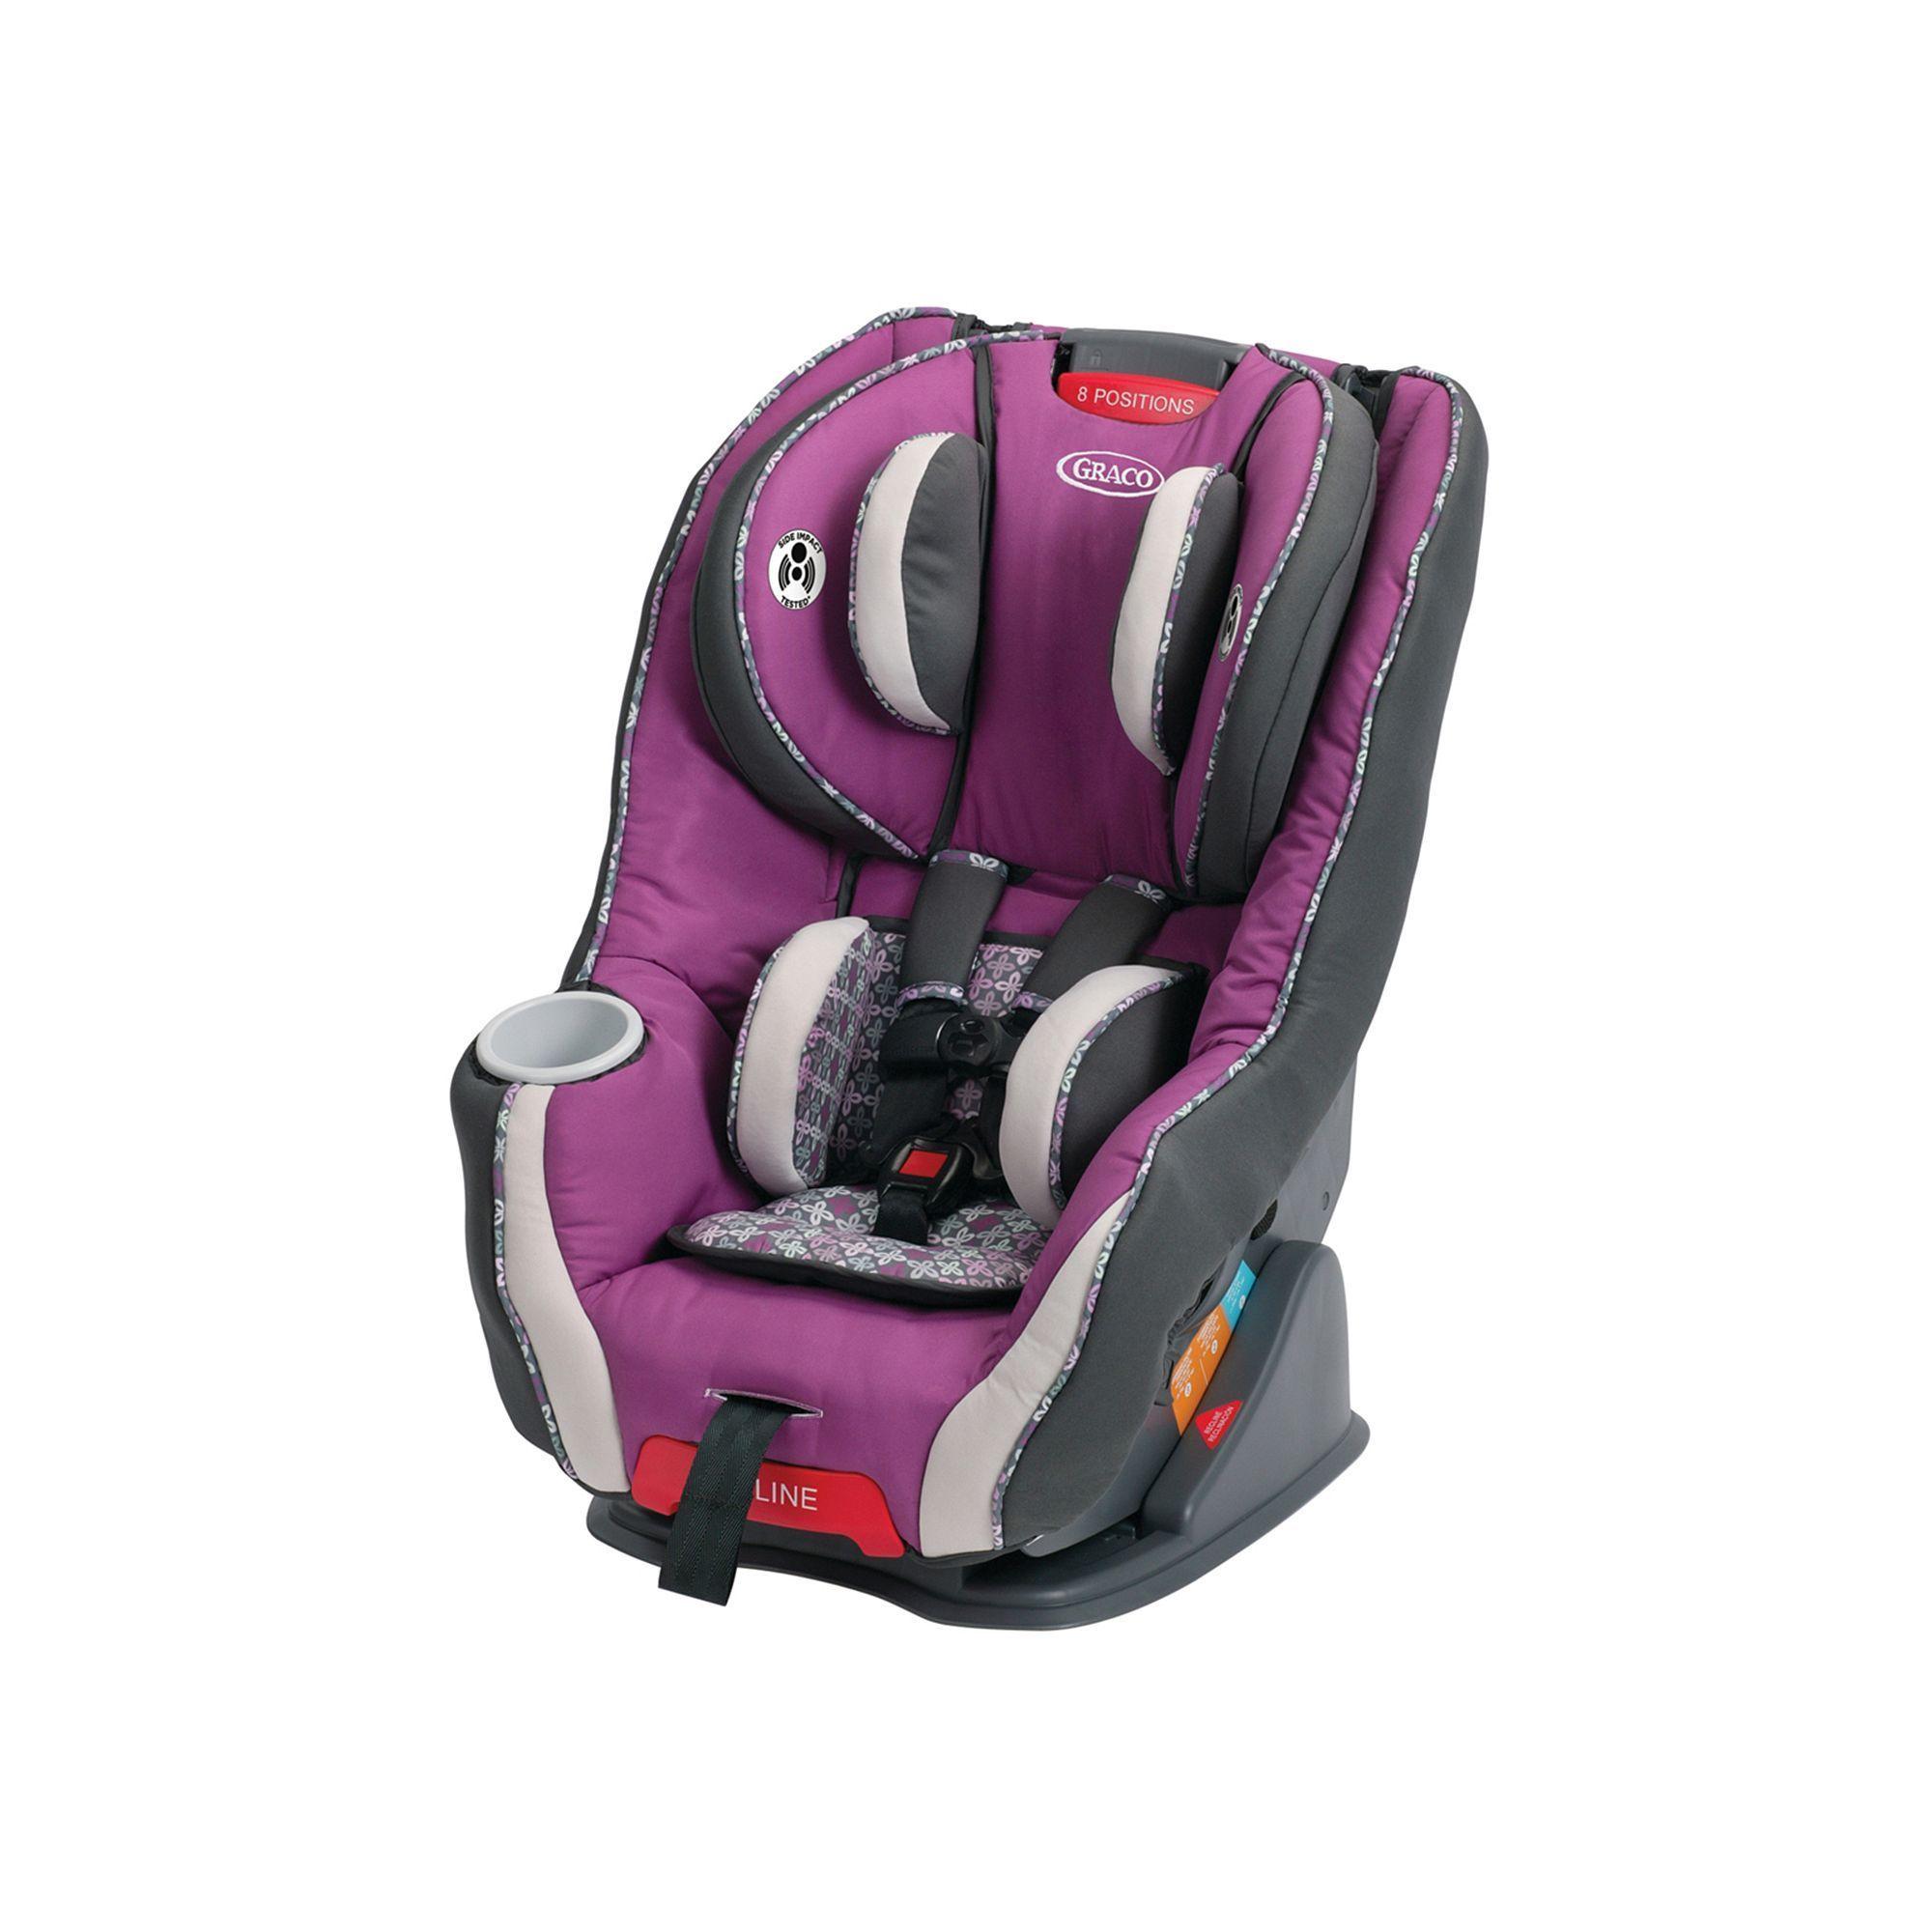 Medium Of Graco Size4me 65 Convertible Car Seat